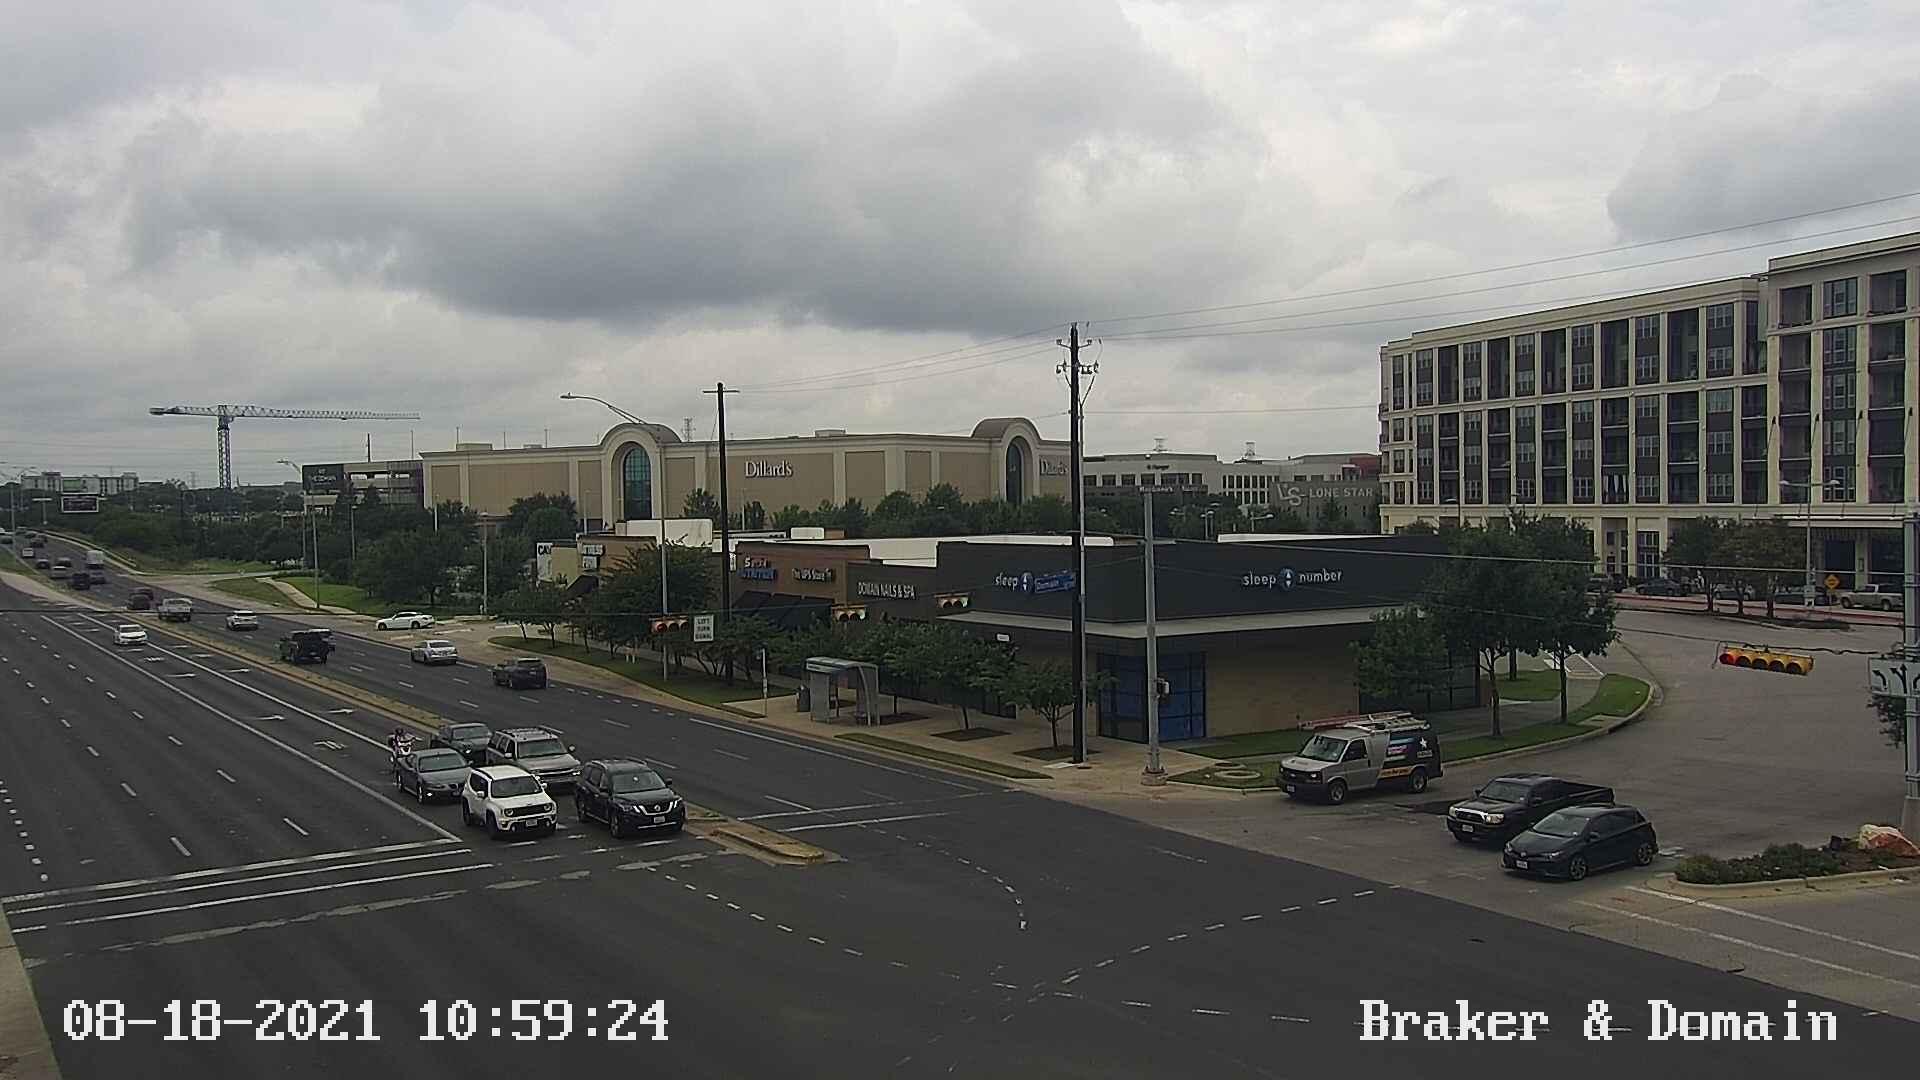 BRAKER LN / DOMAIN DR (Pickle Research Campus Driveway)